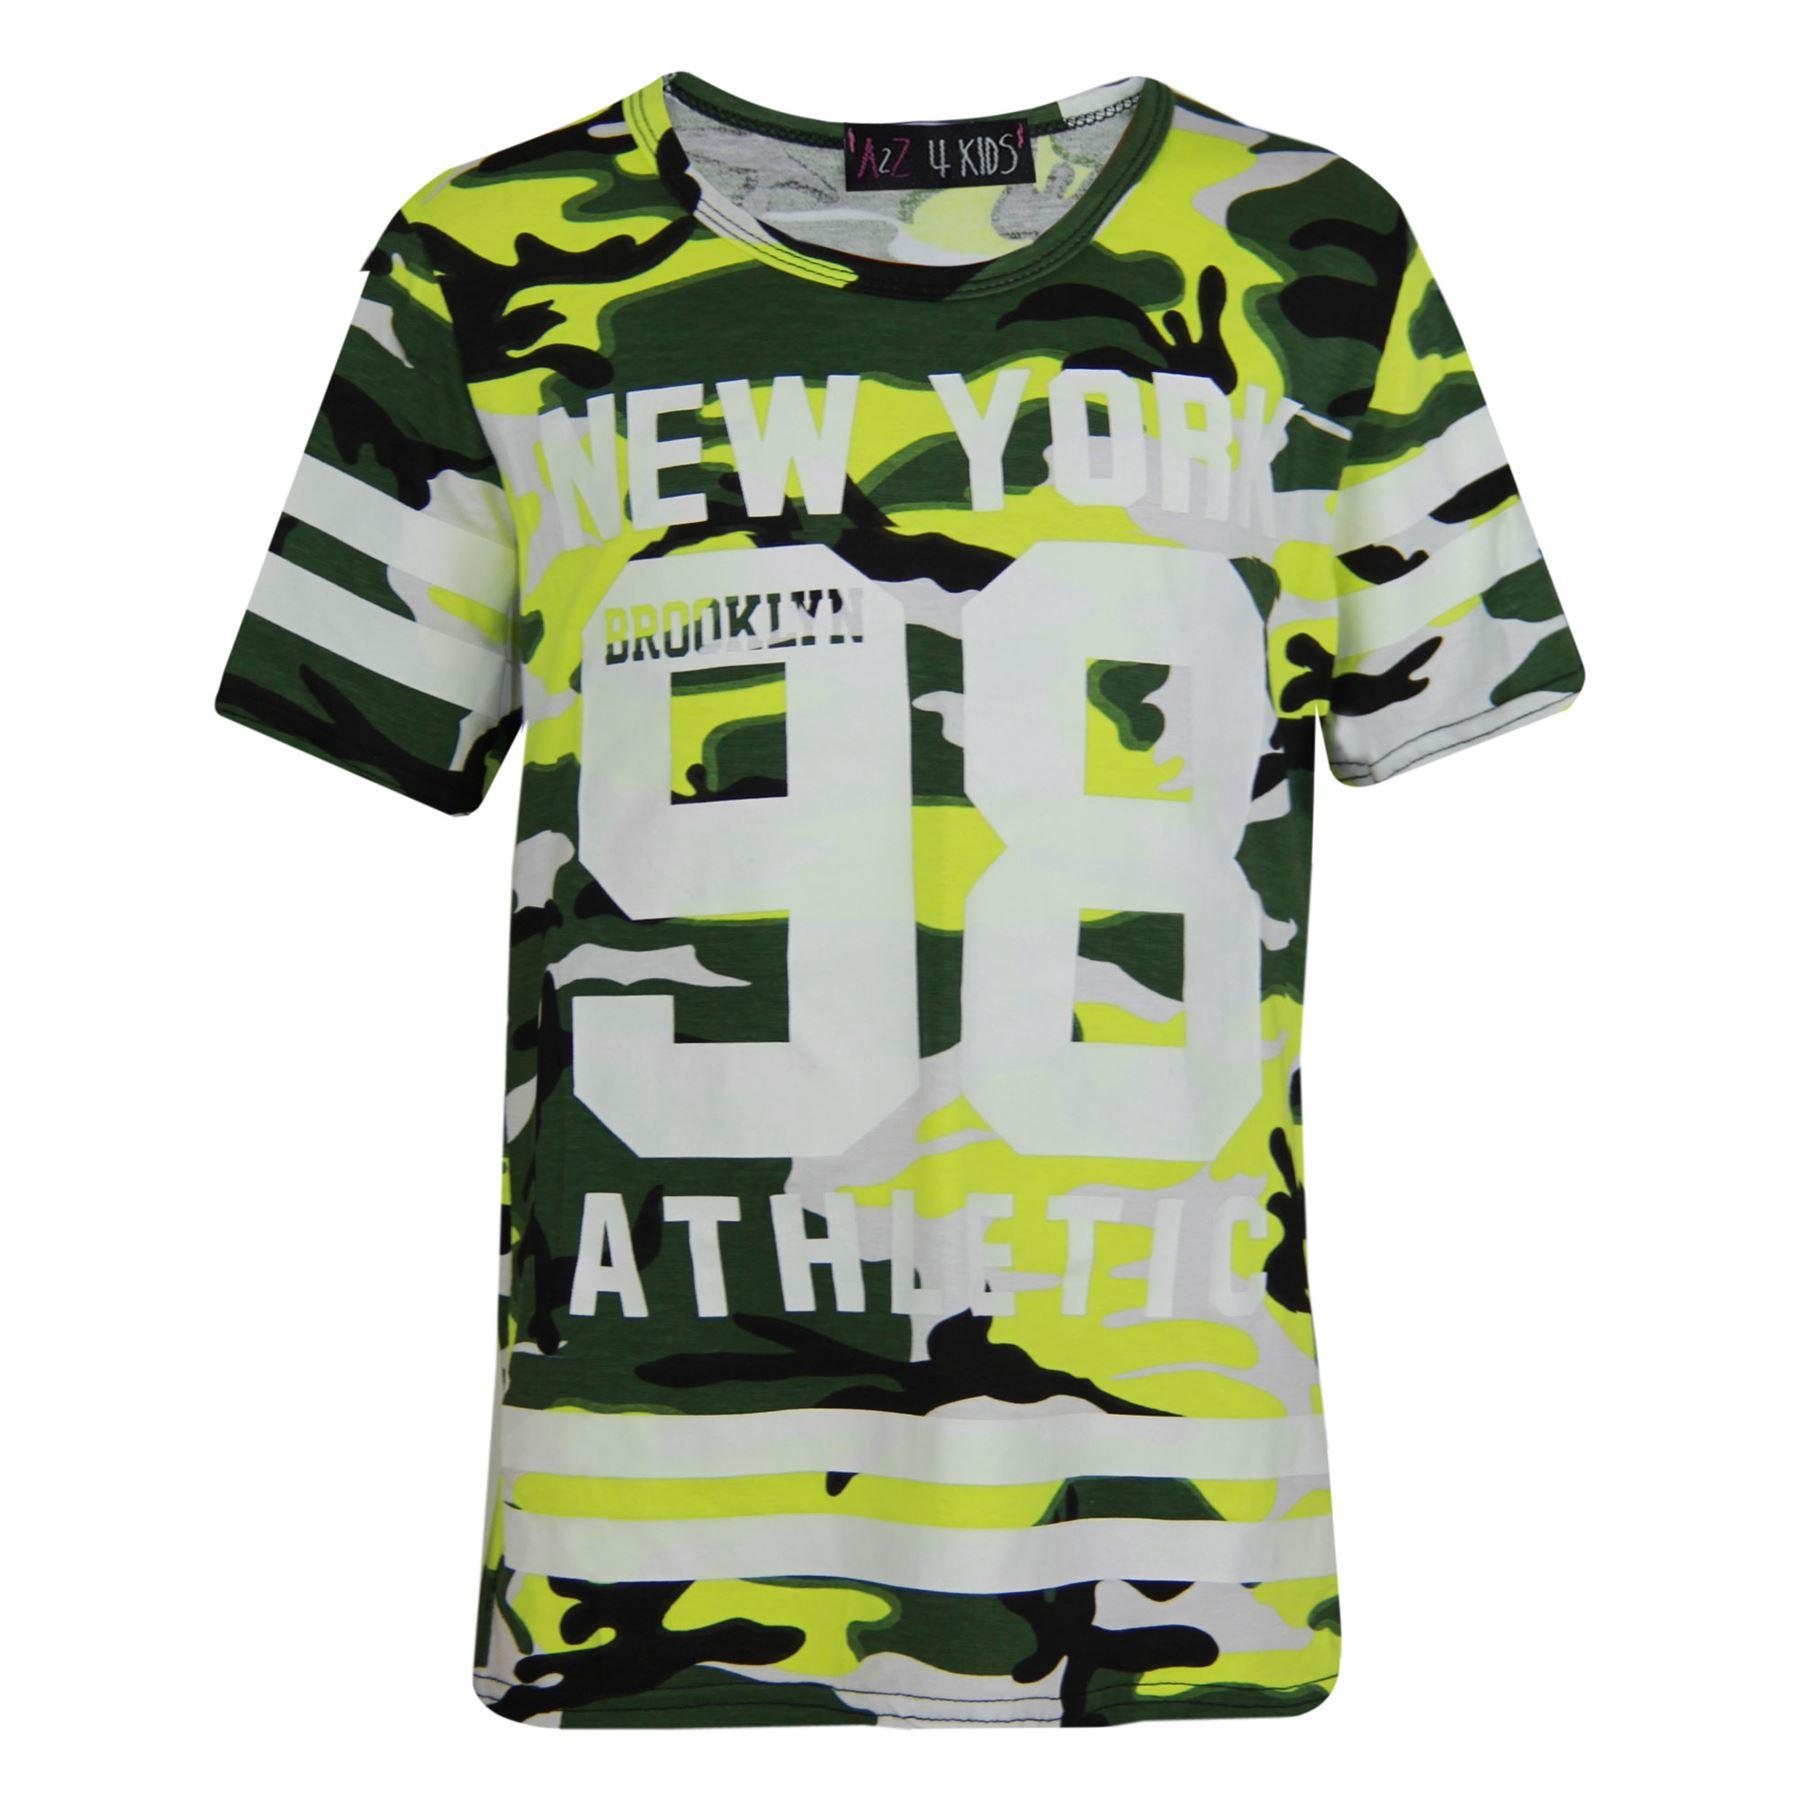 Girls-NEW-YORK-BROOKLYN-98-ATHLECTIC-Camouflage-Print-Top-amp-Legging-Set-7-13-Yr thumbnail 37